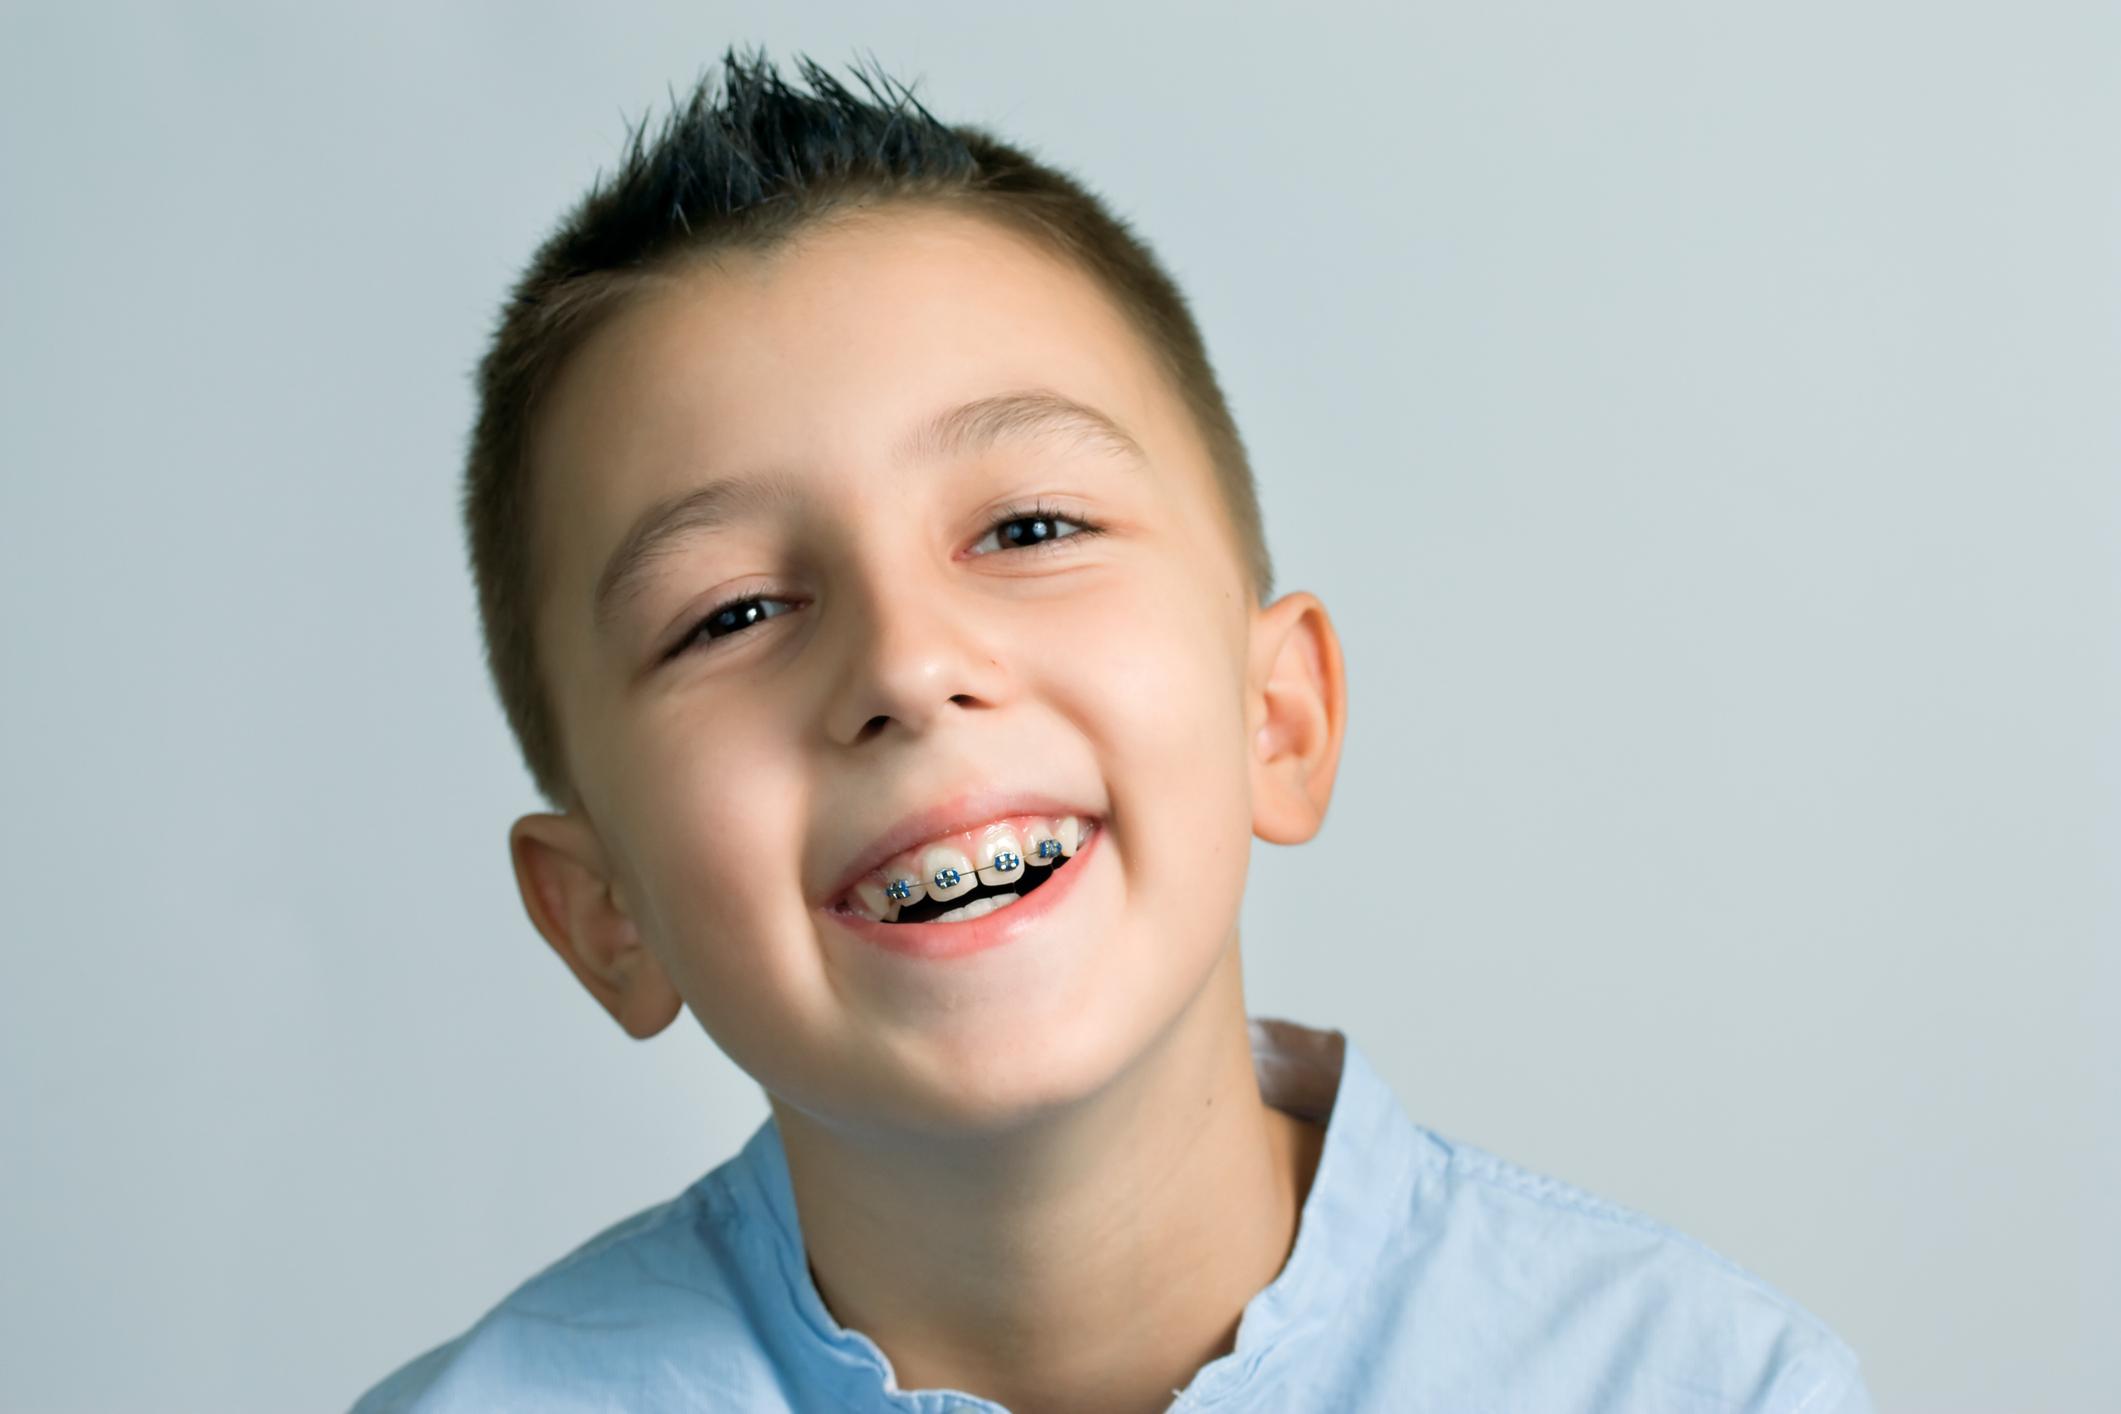 kid-smile-early-treatment-braces.jpg